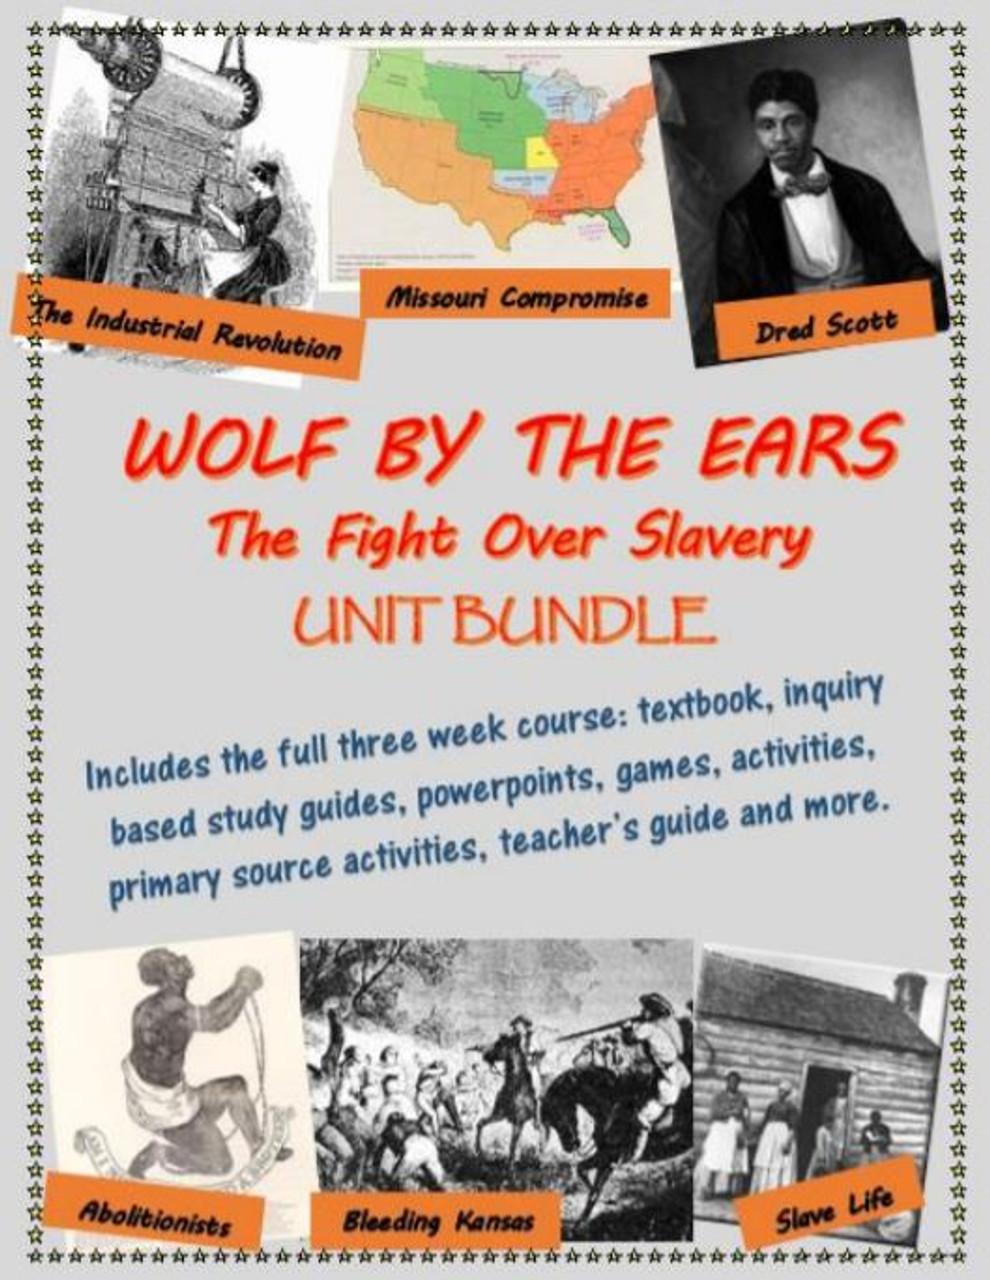 American Slavery, Civil War and Reconstruction 2 Unit Bundle, including text